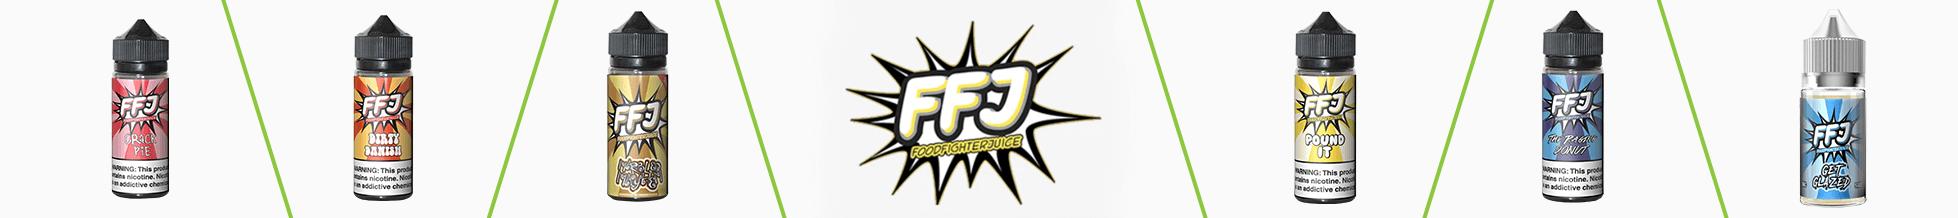 food-fighter-ffj.png